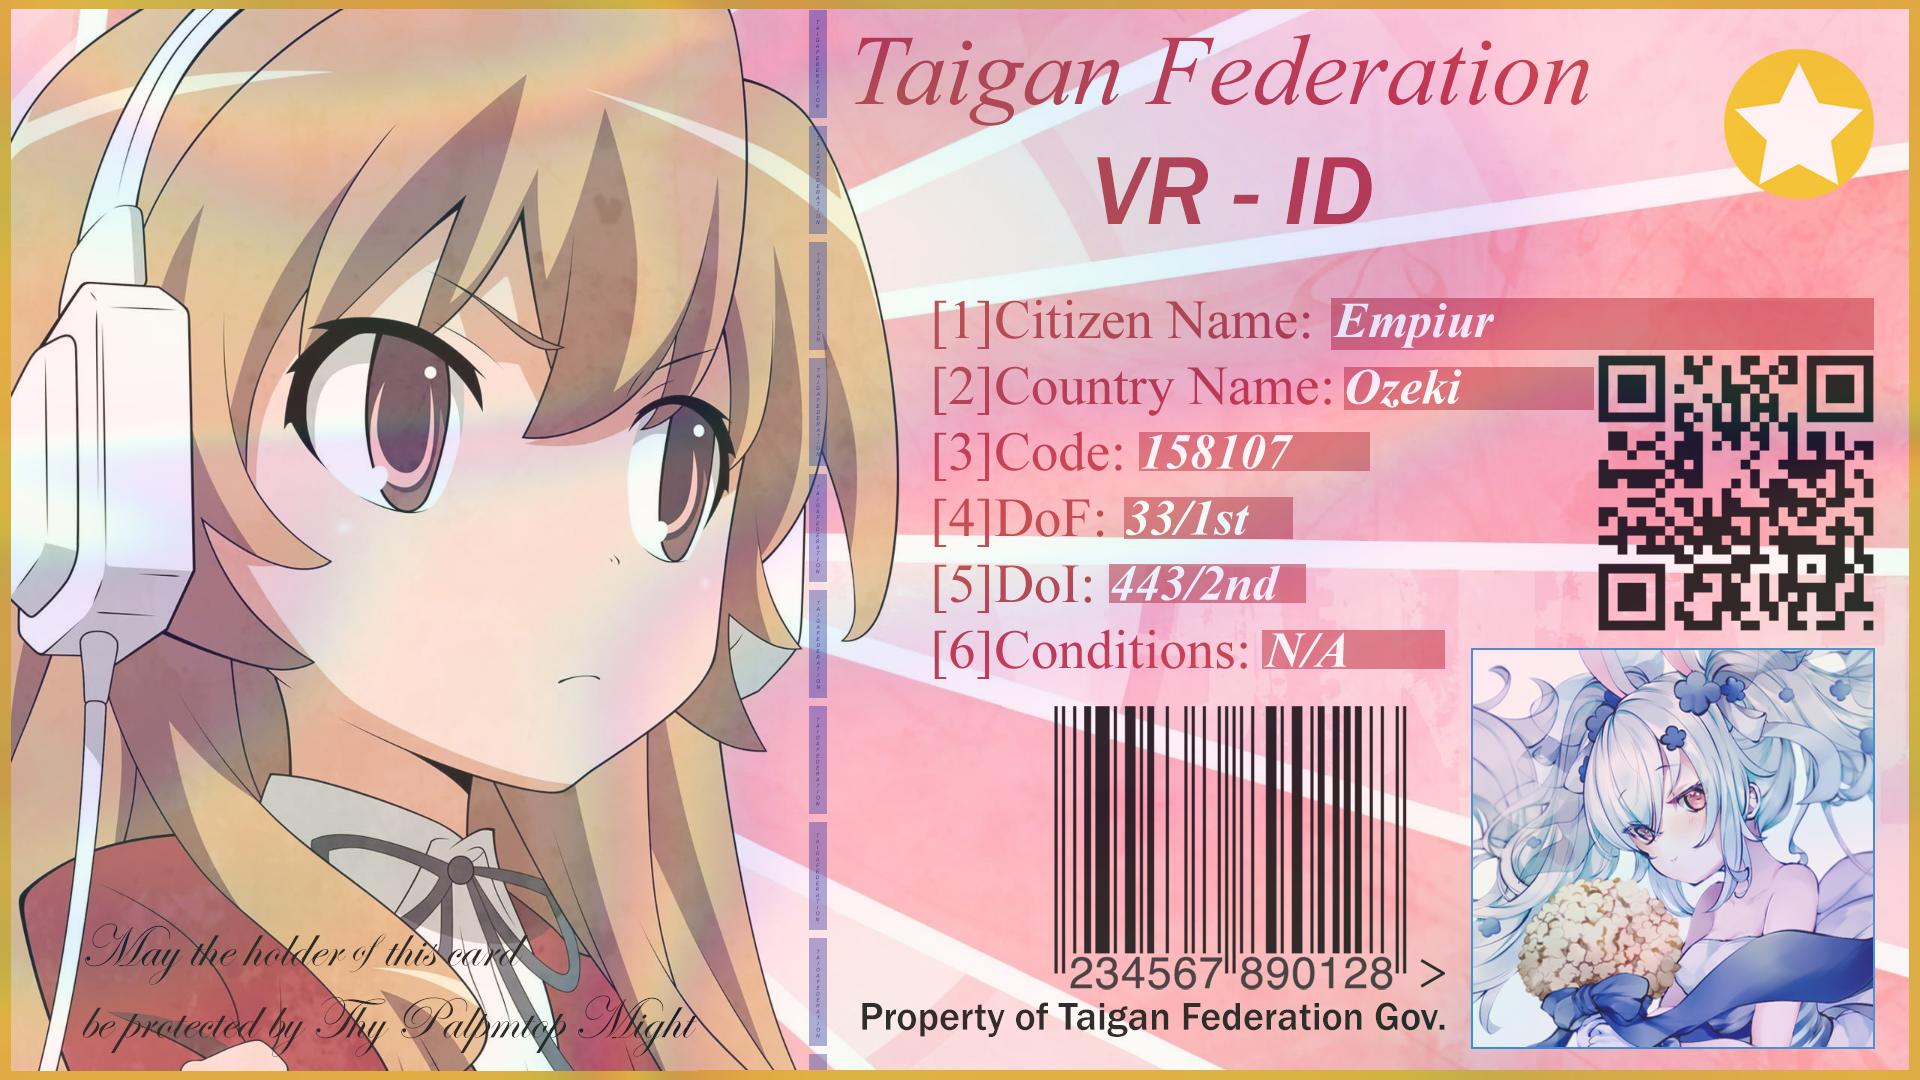 ID_Empiur.png